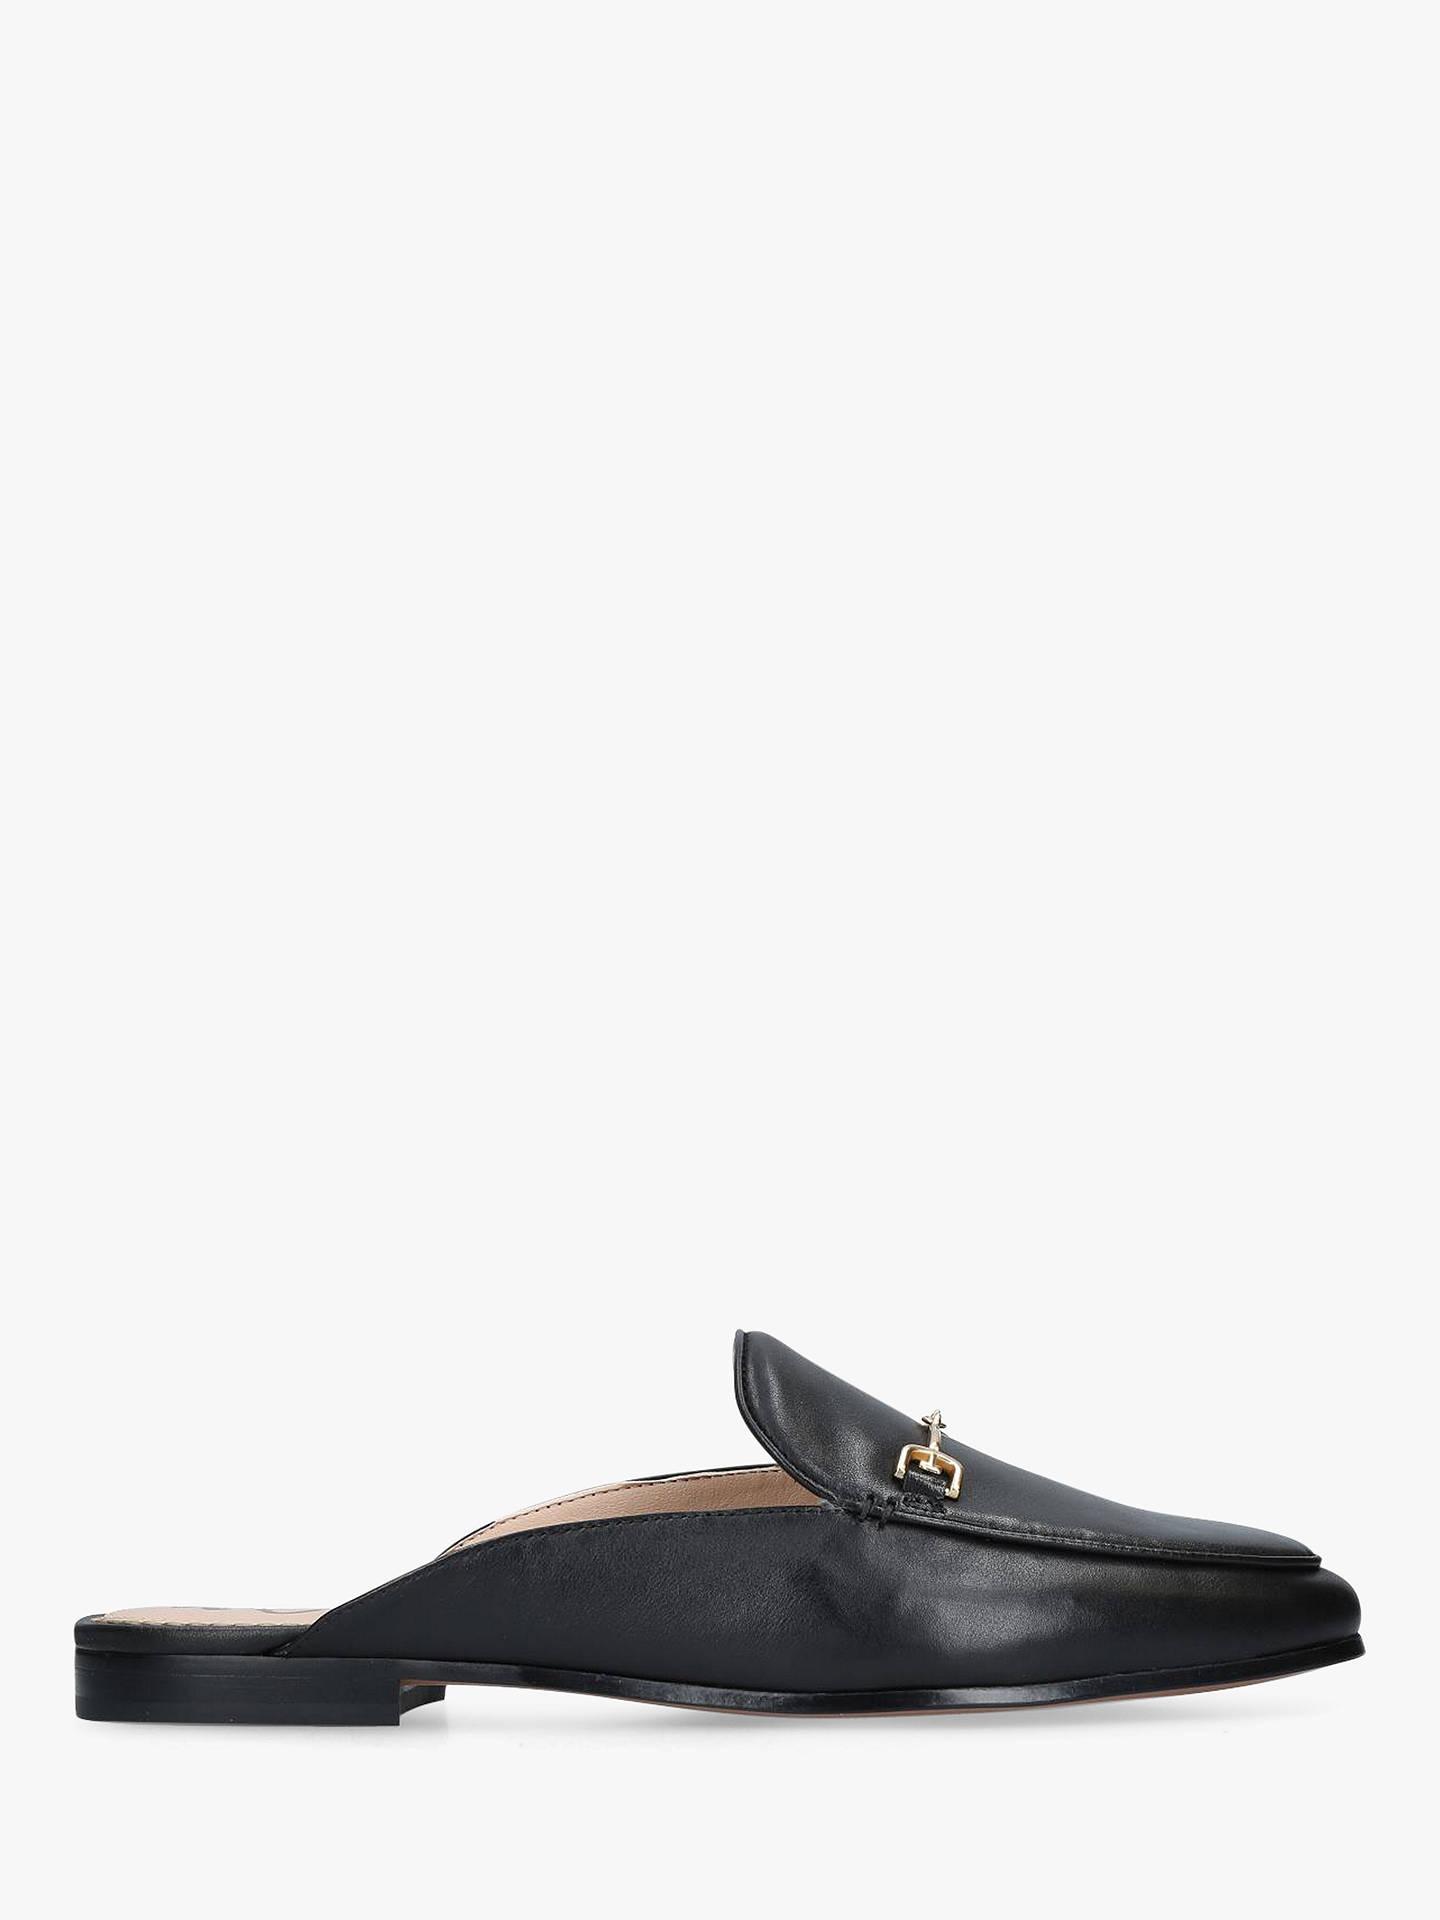 42c7ab37070d Buy Sam Edelman Linnie Mule Loafers, Black Leather, 2 Online at  johnlewis.com ...